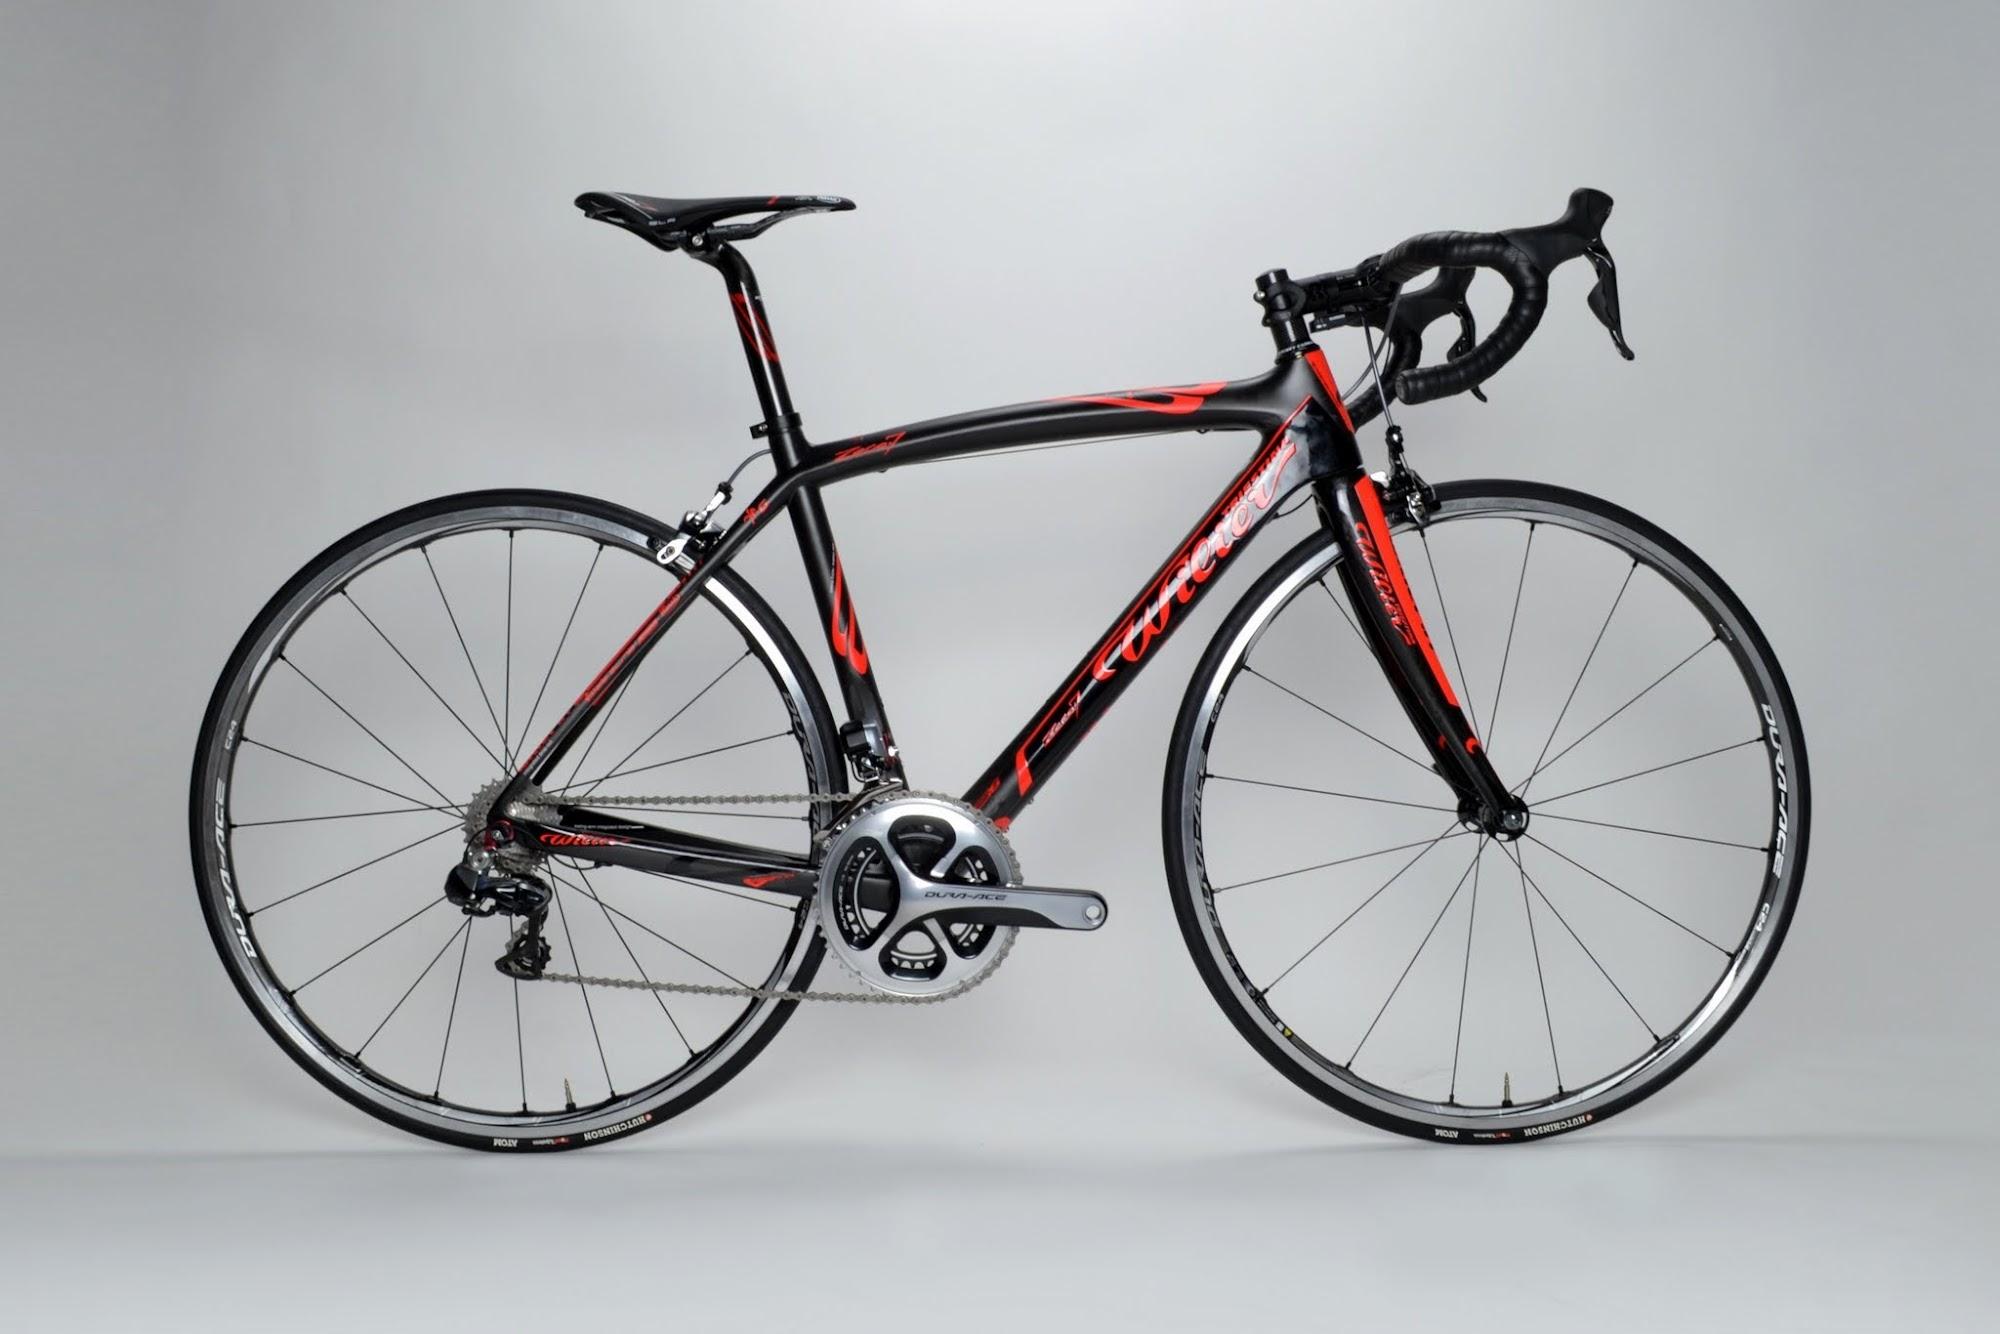 www.twohubs.com: Wilier Triestina Zero.7 Shimano Dura Ace 9070 Di2 Complete Bike at twohubs.com